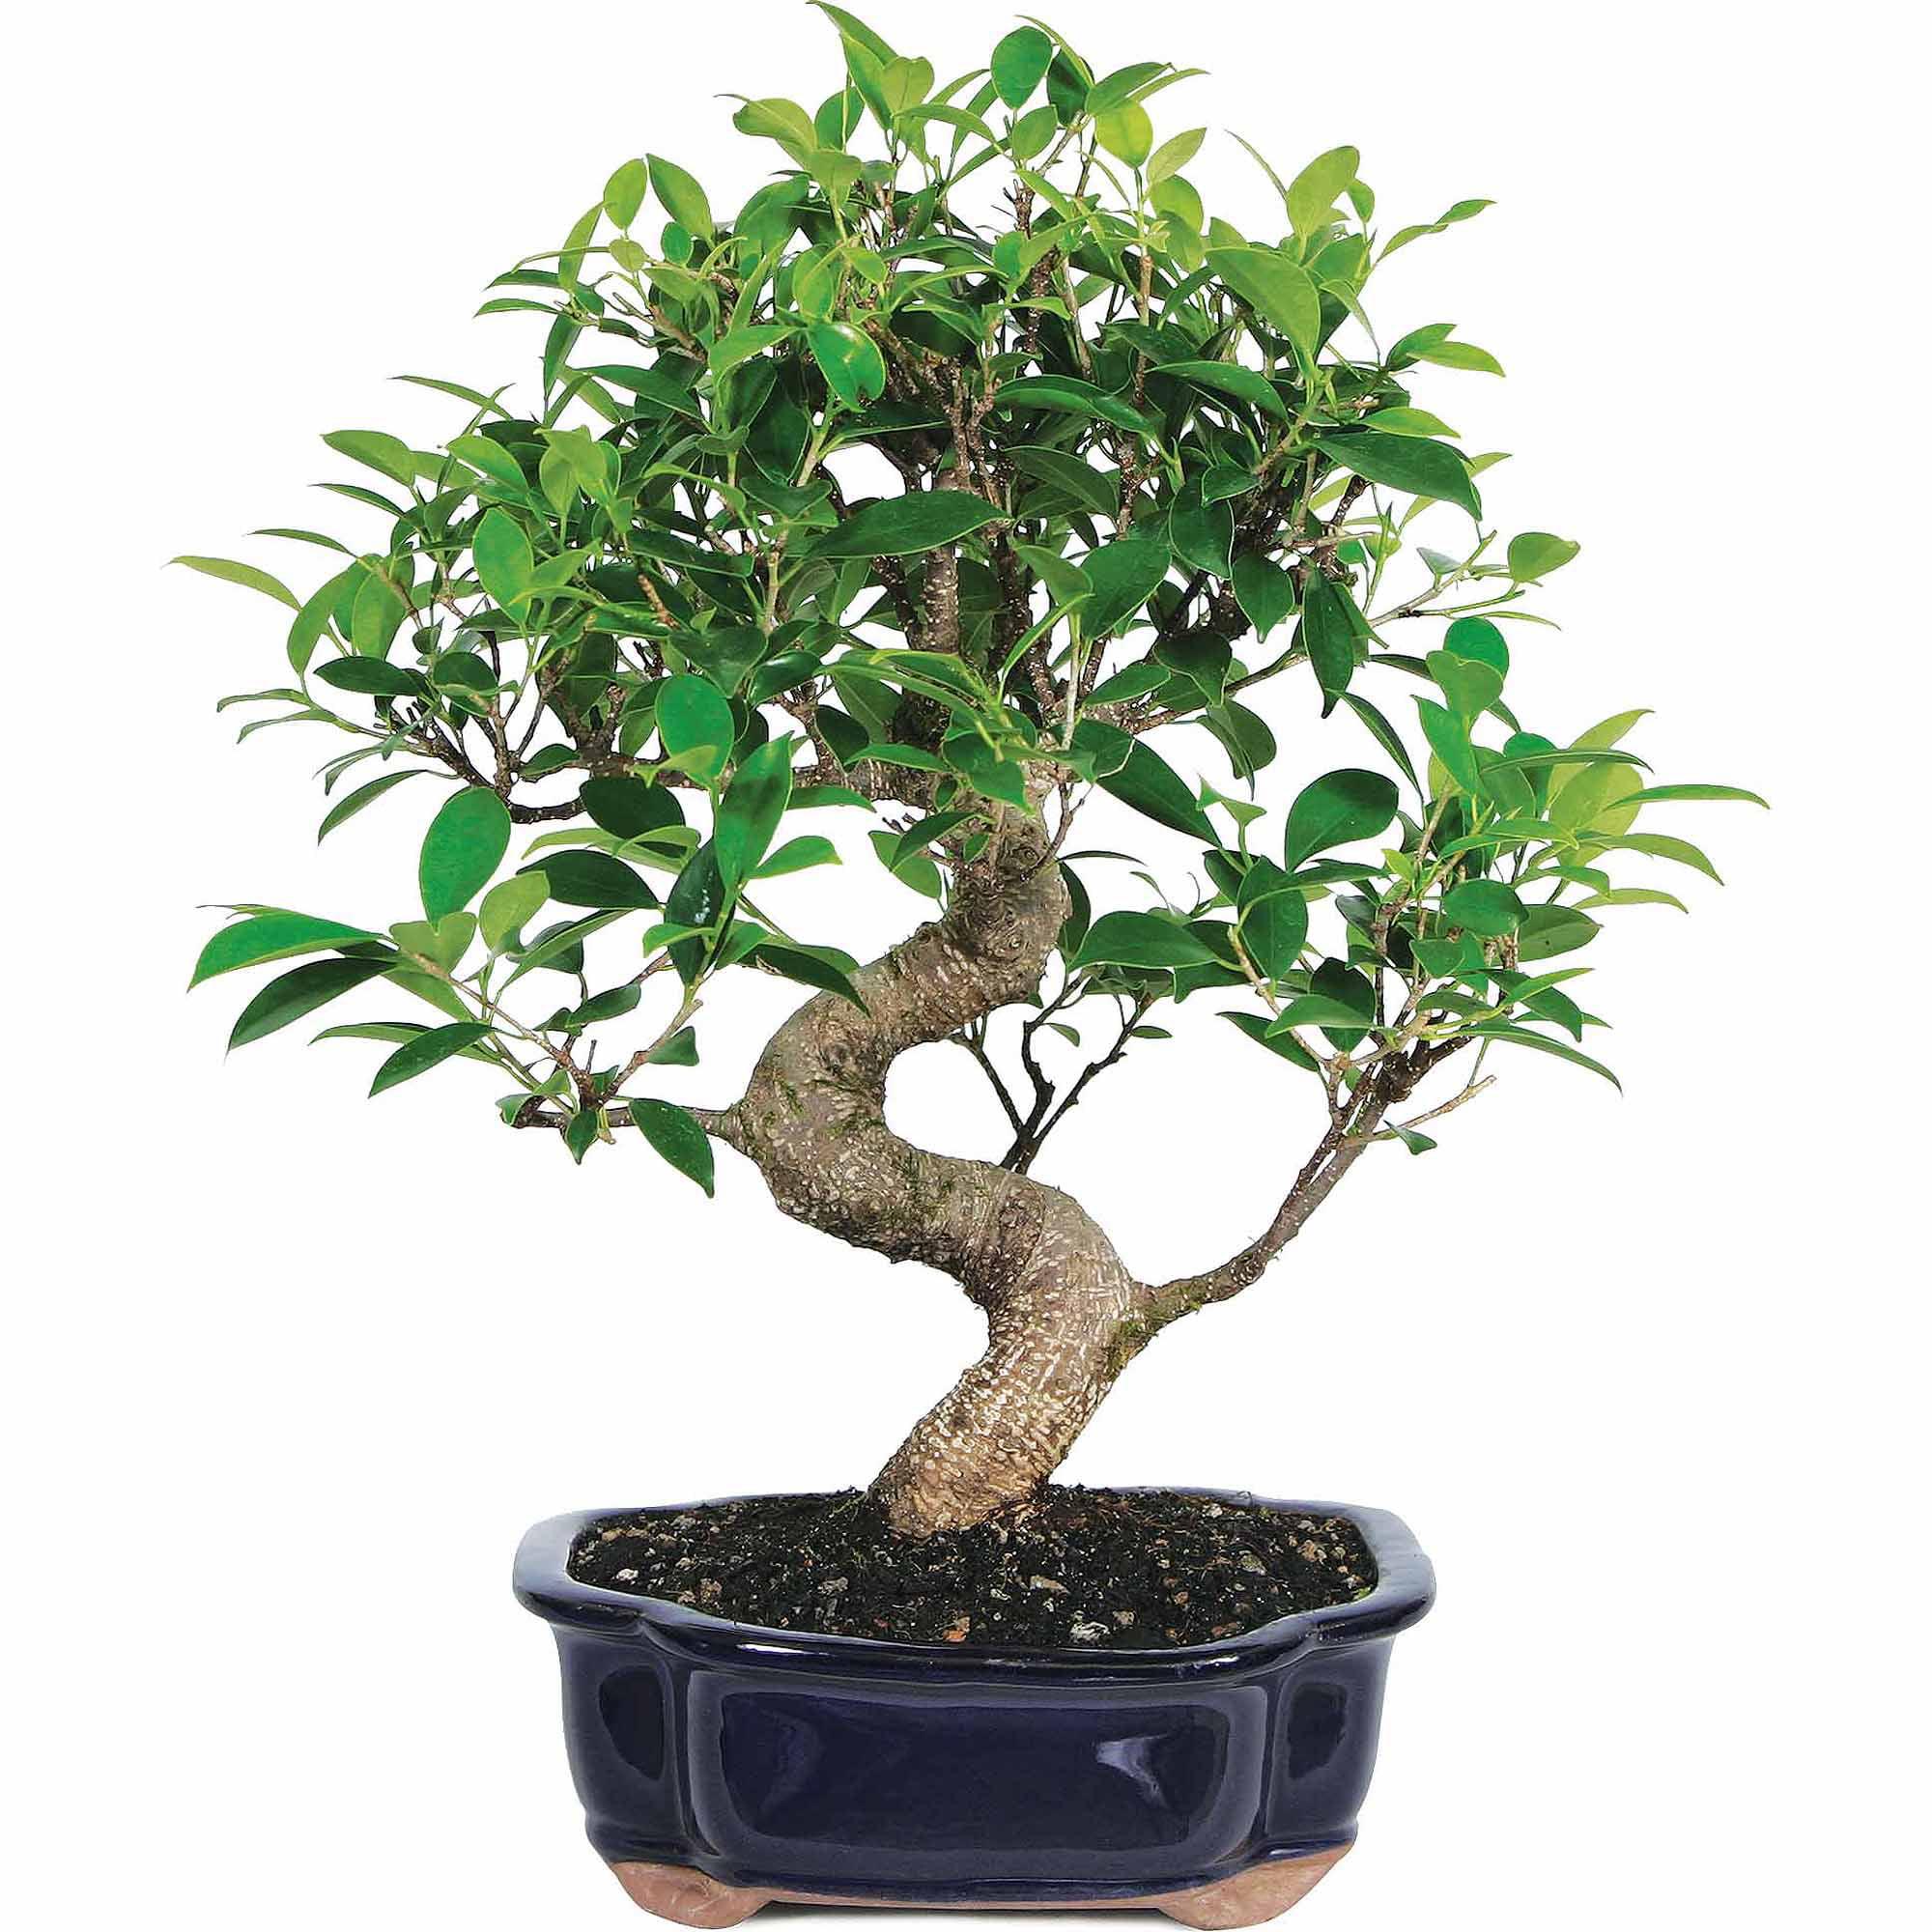 golden gate ficus bonsai tree by brussel 39 s bonsai at. Black Bedroom Furniture Sets. Home Design Ideas